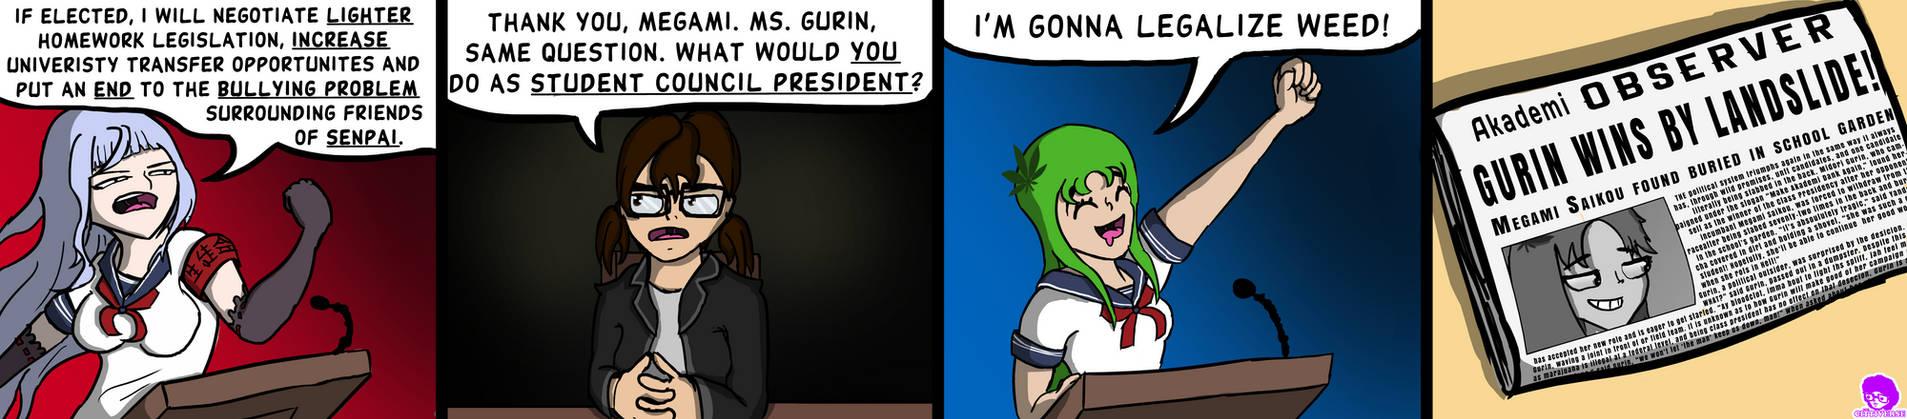 Dank Midori #7 - 'The Election'